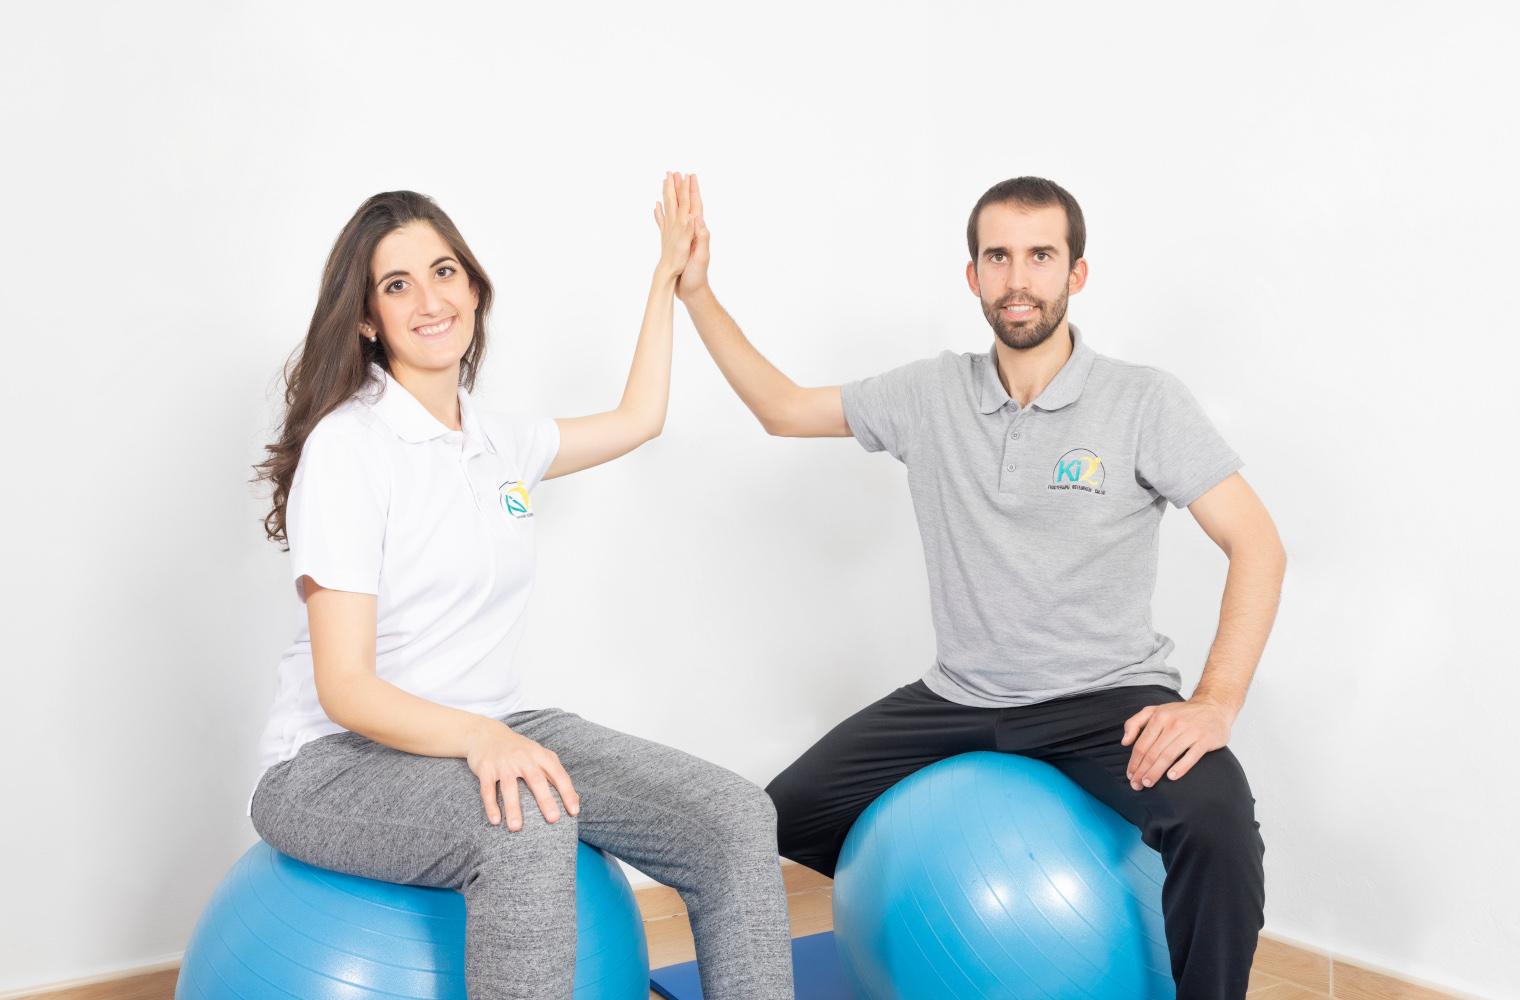 fisioterapia osteopatia suelo pelvico huelva